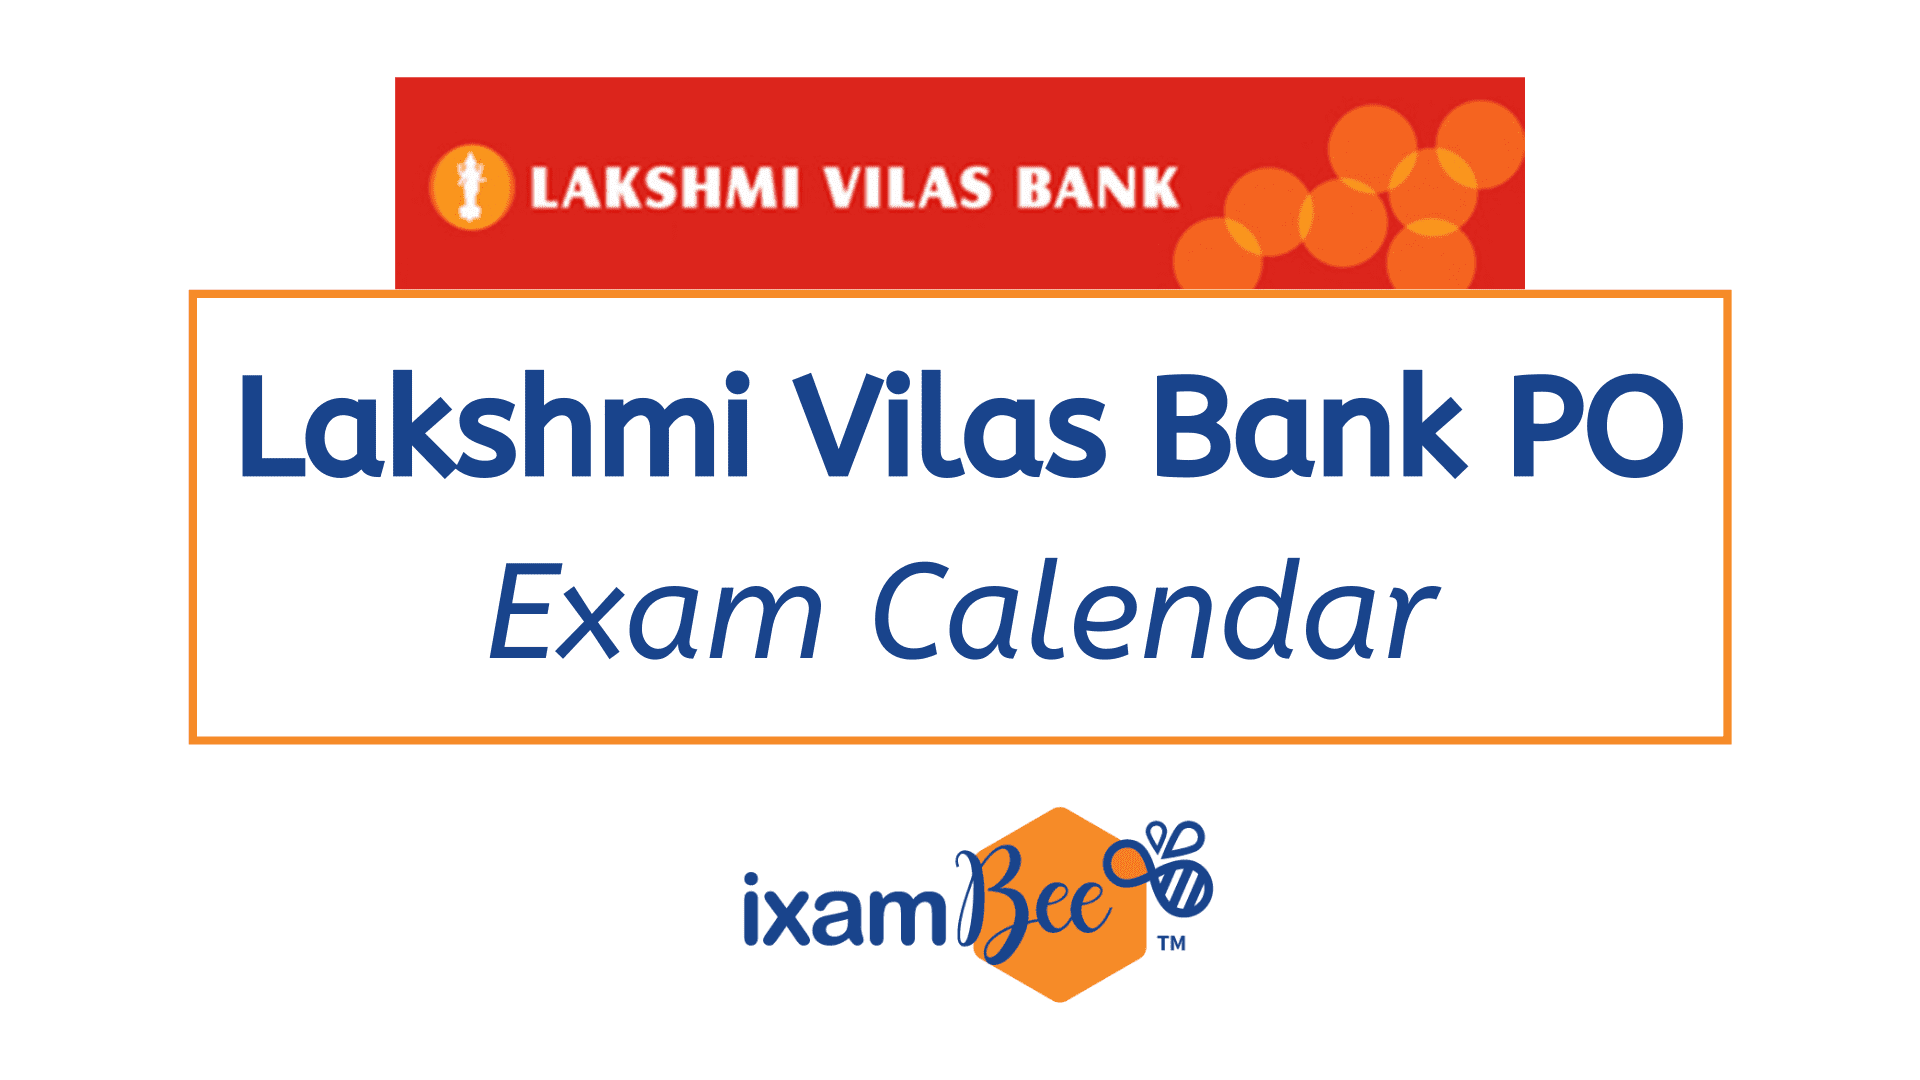 Lakshmi Vilas Bank PO Exam Calendar